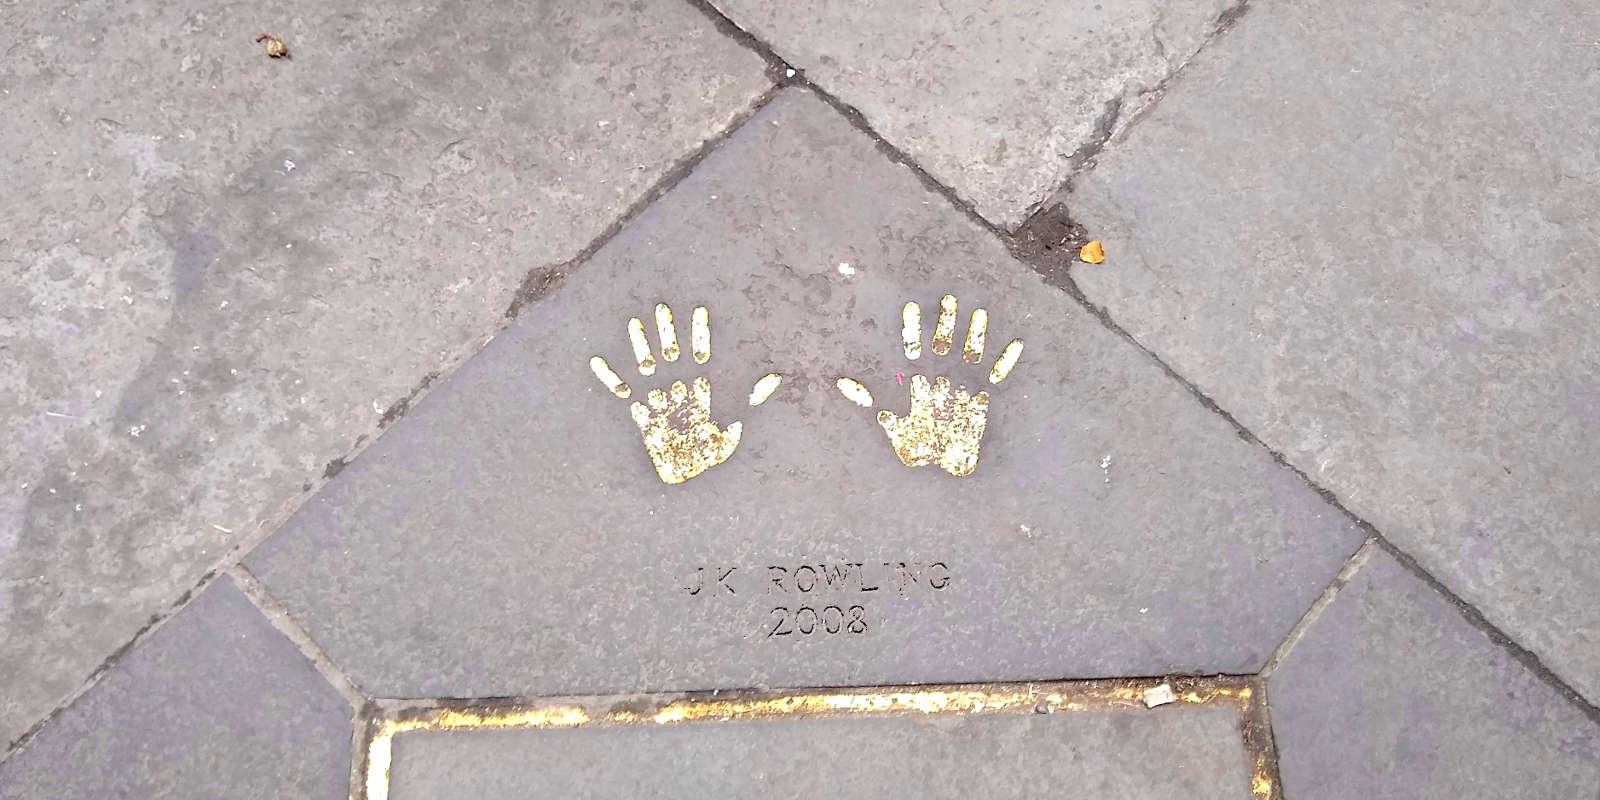 Golden handprints of JK Rowling outside Edinburgh City Chambers